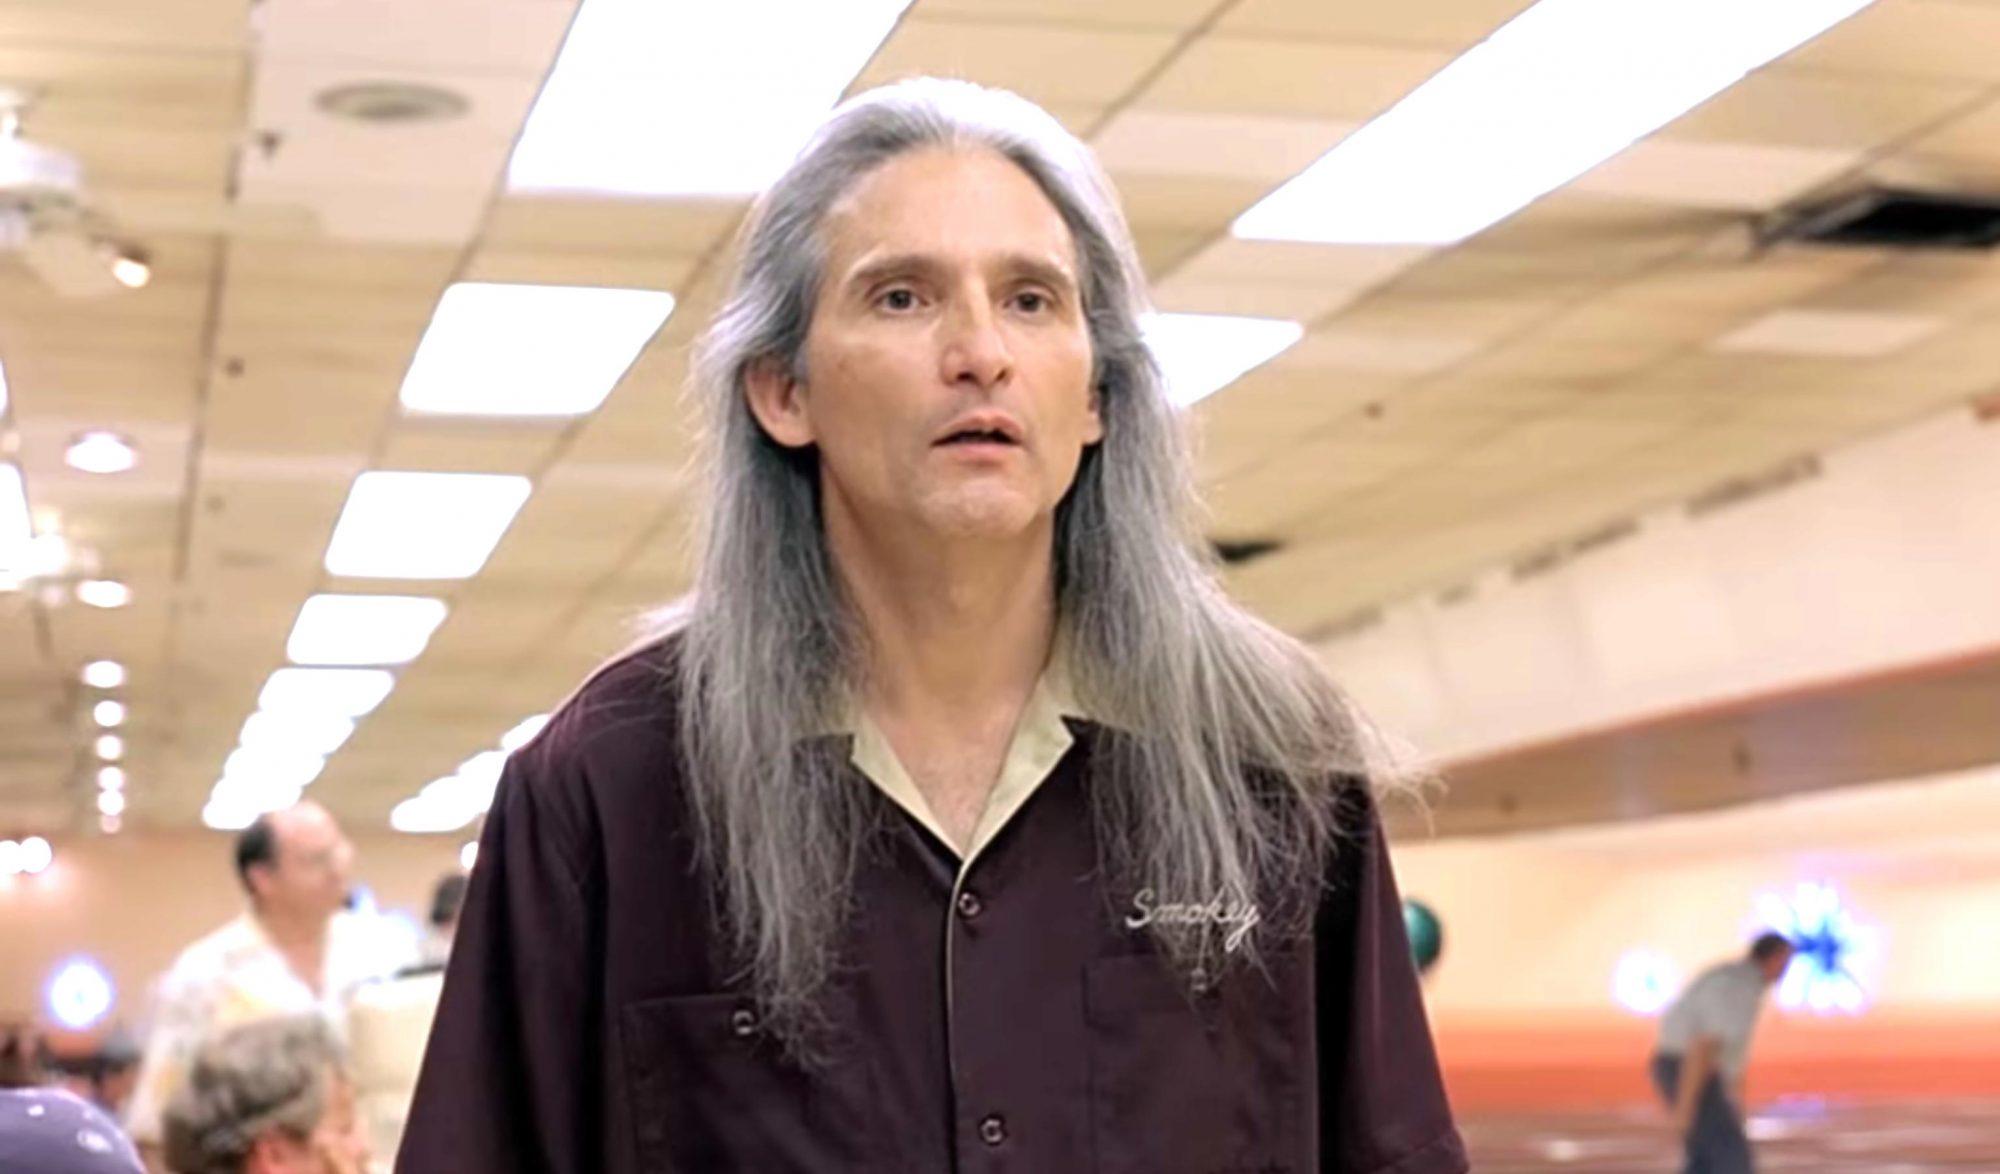 The-Big-Lebowski-Jimmie-Dale-Gilmore